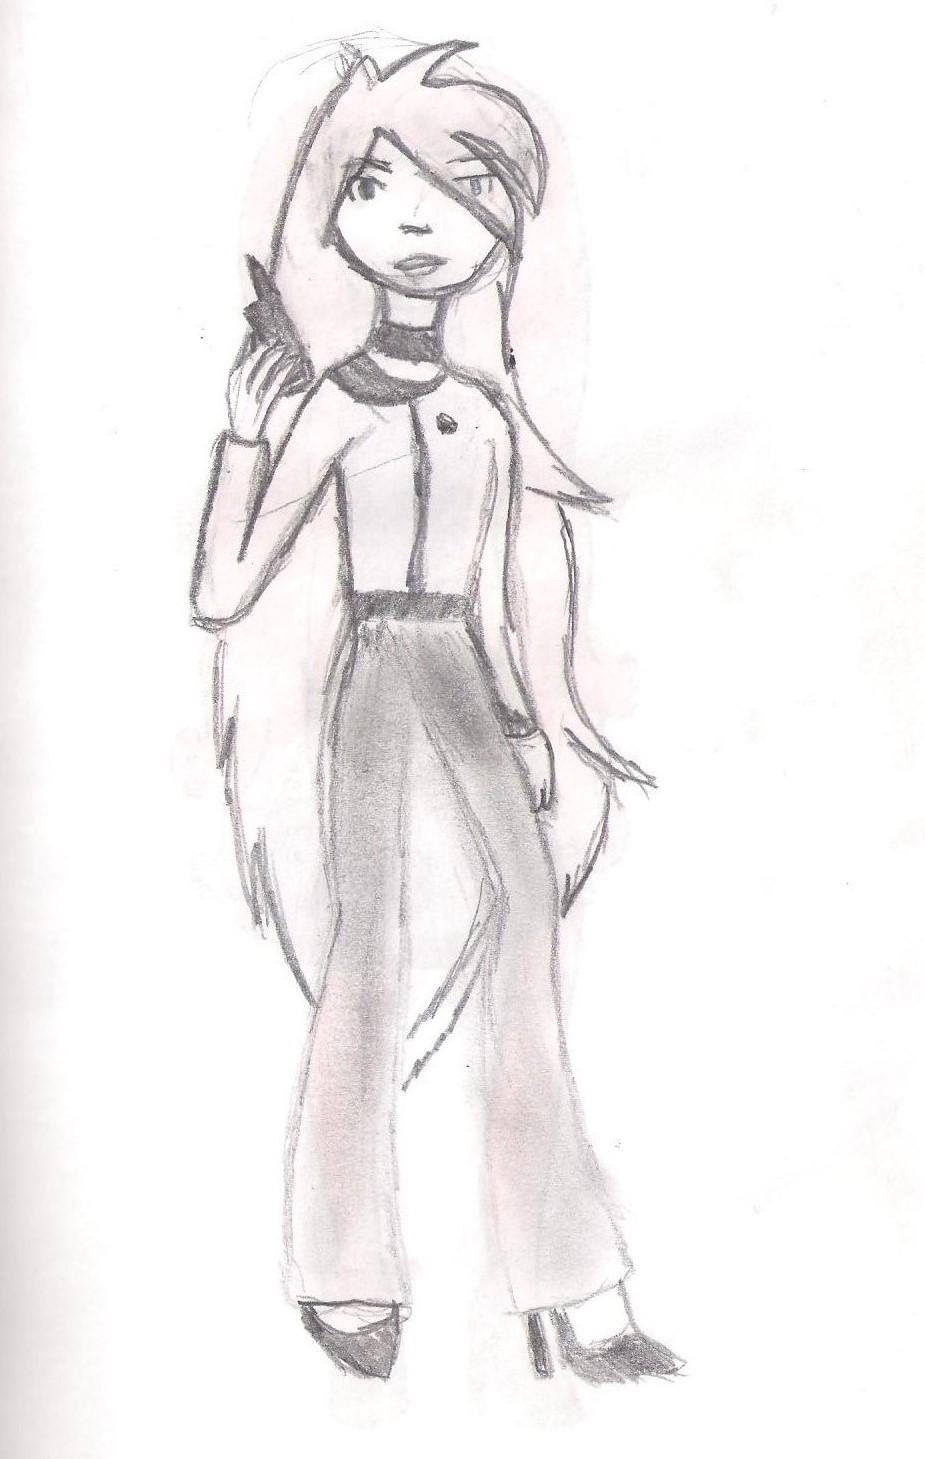 Girl by Lunajula